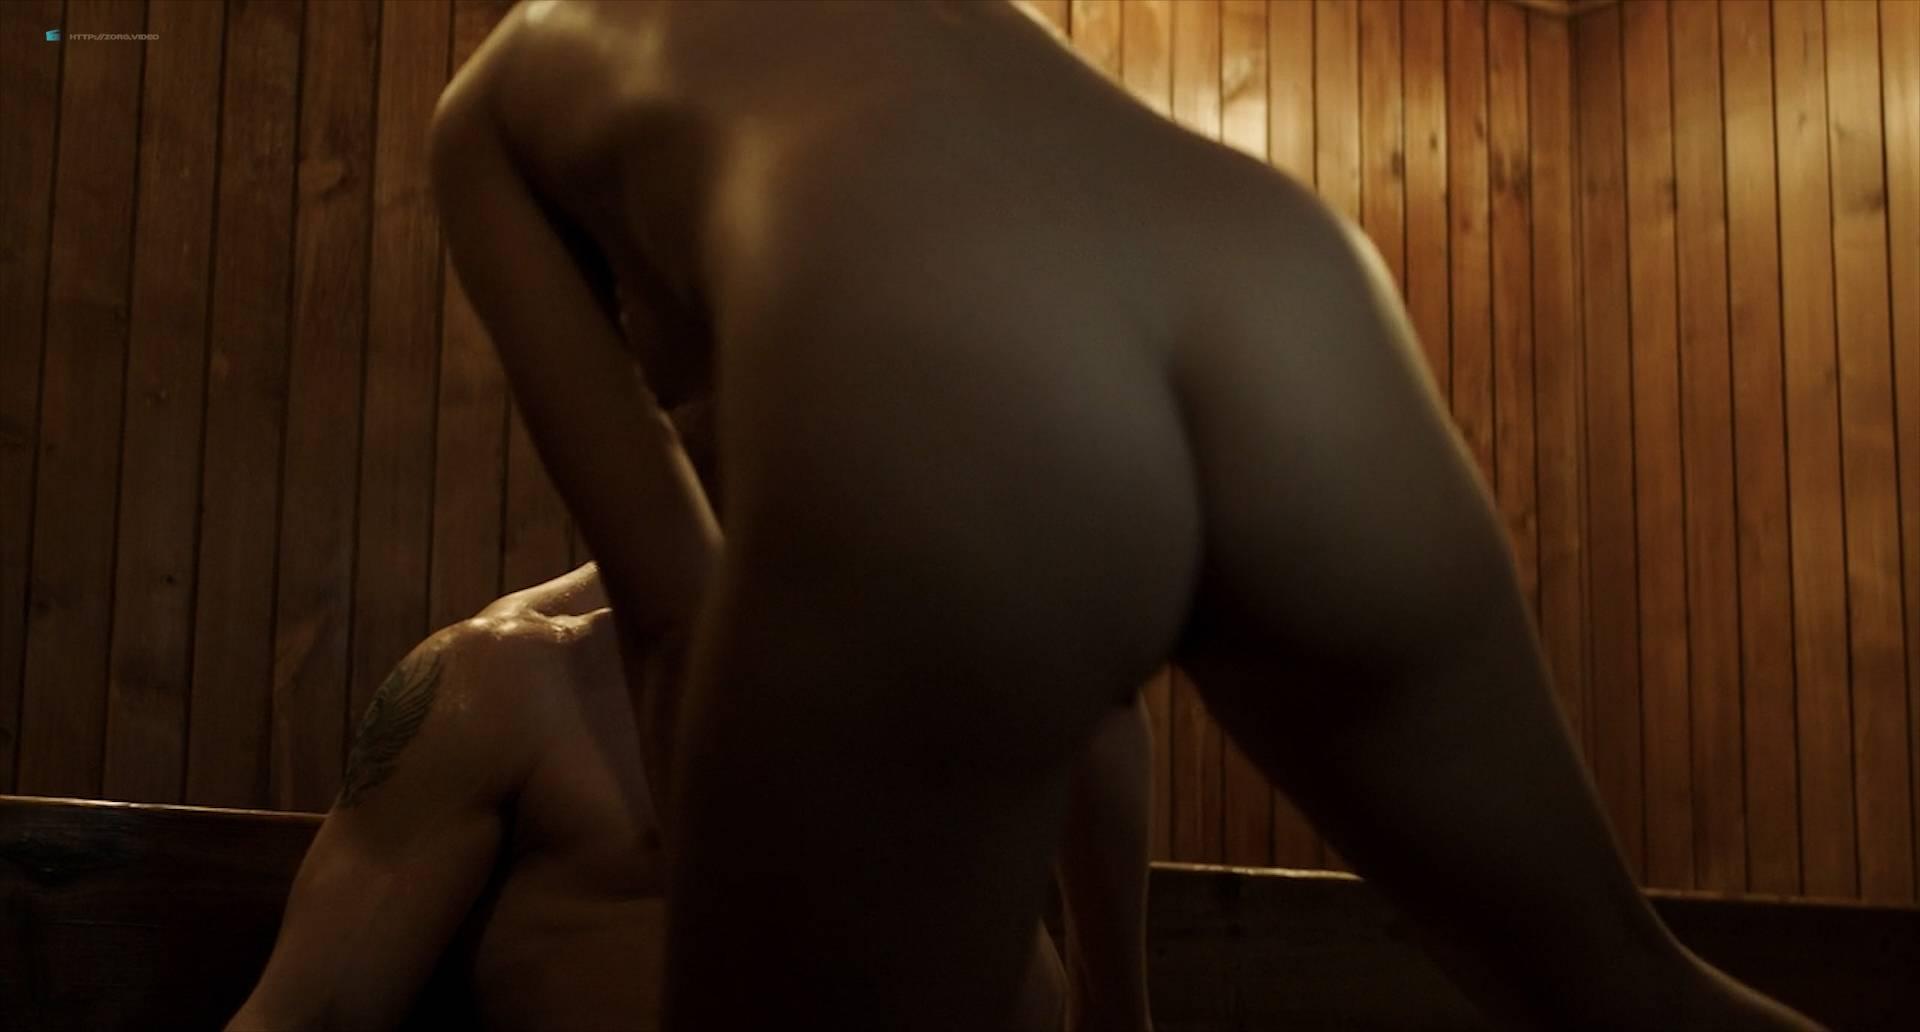 Watch Maud jurez nude section zero 2016 s01e05 hd video